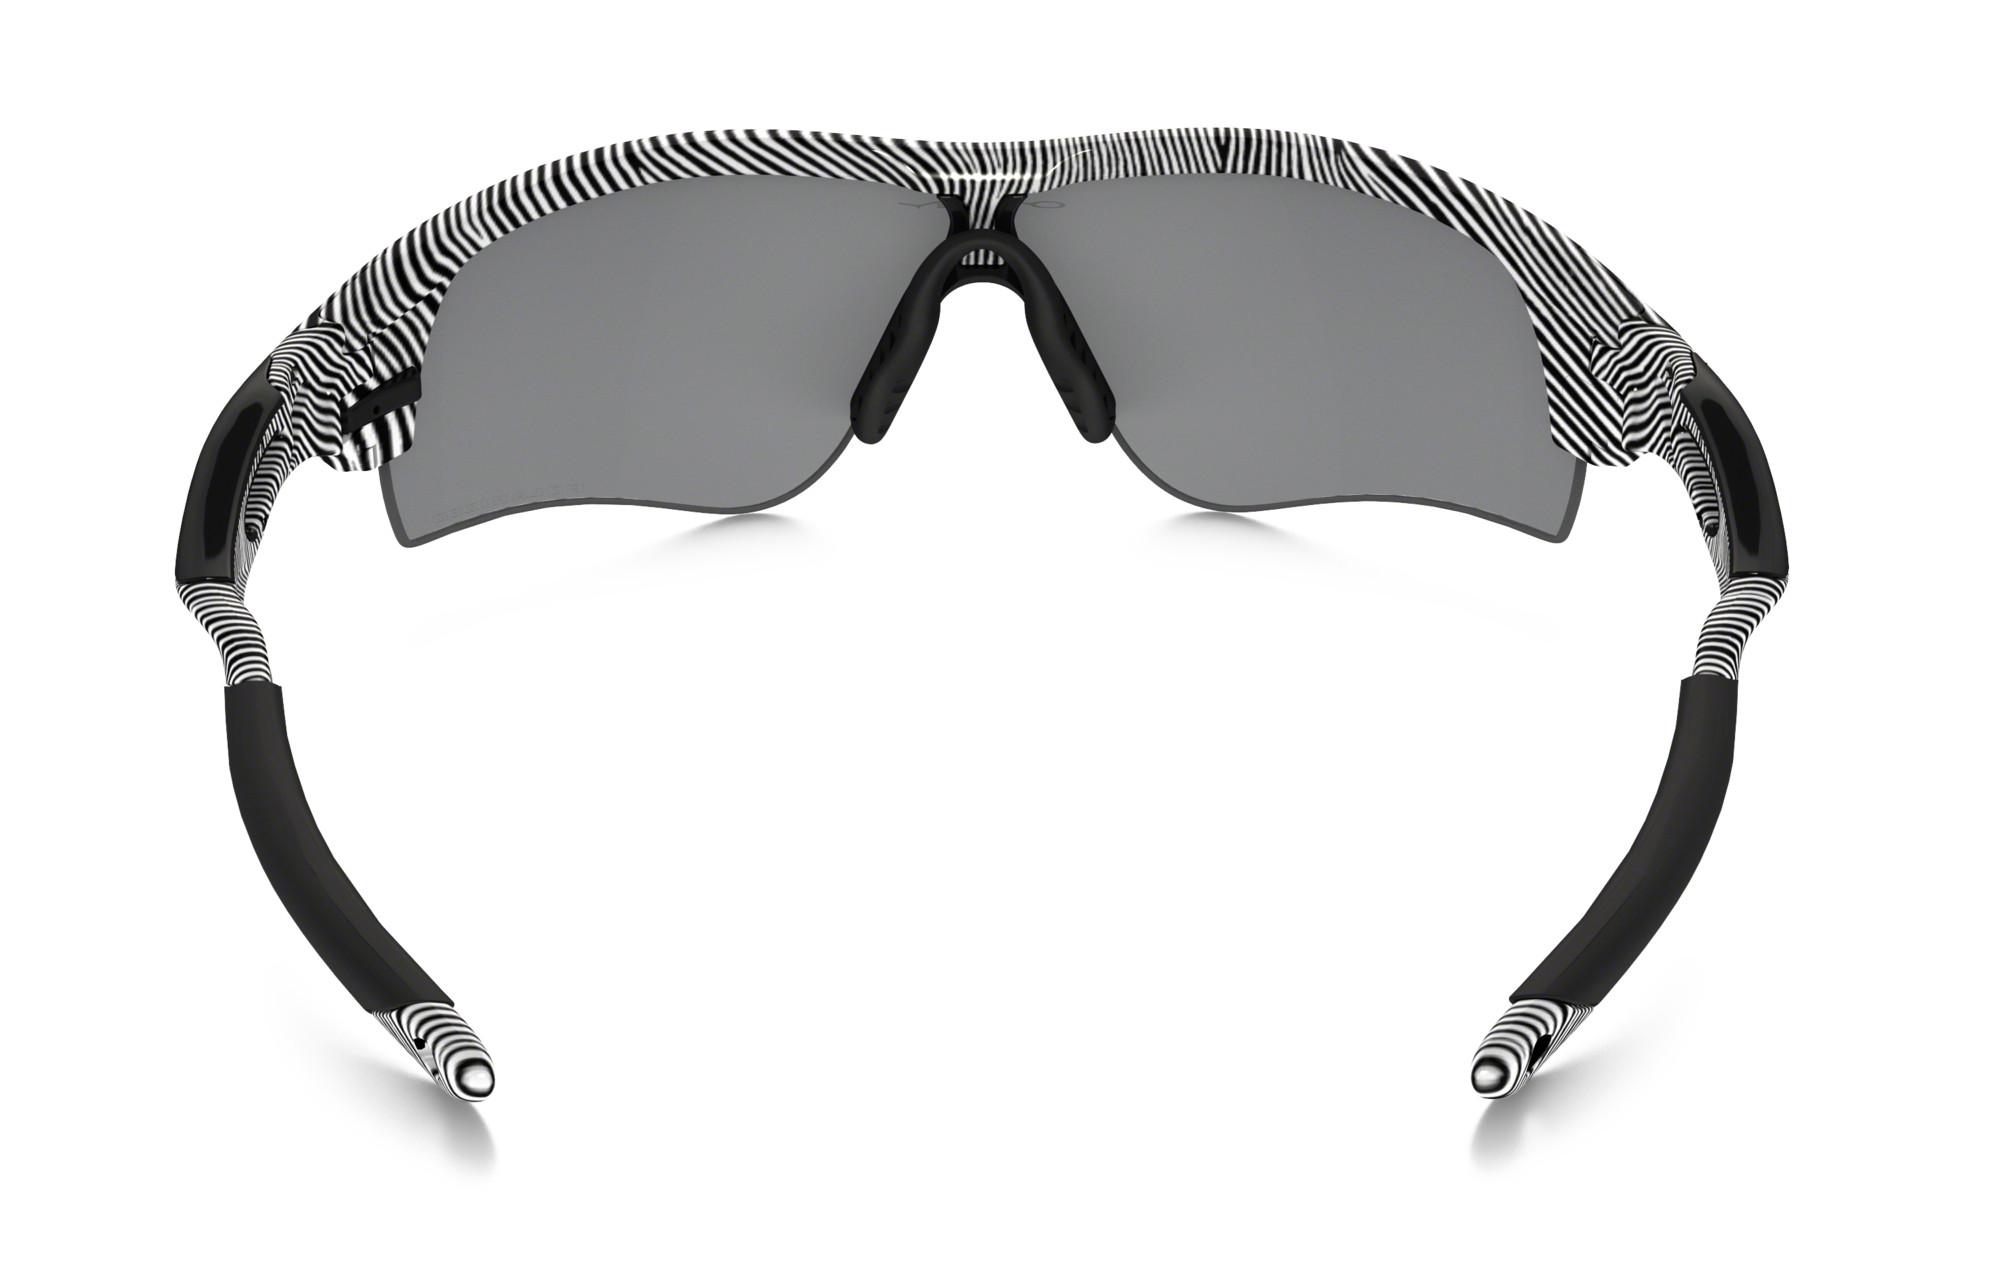 04b5acdbb58b02 OAKLEY Paire de lunettes FINGERPRINT POLARIZED RADARLOCK PATH Blanc Black  Iridium réf oo9181-44